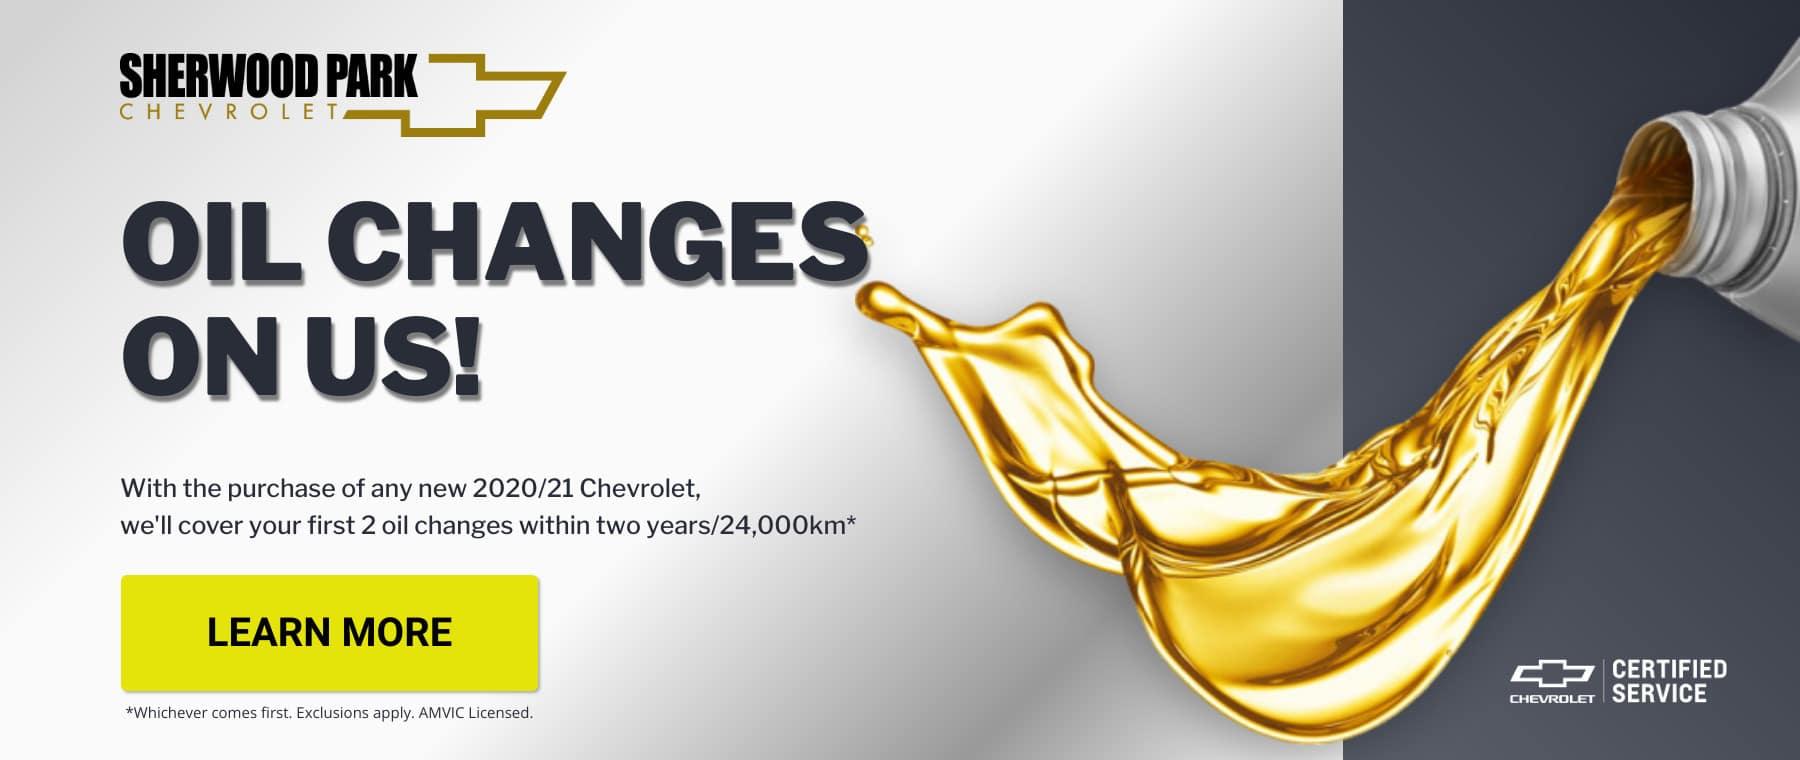 Oil Changes on Us. Sherwood Park Chevrolet.